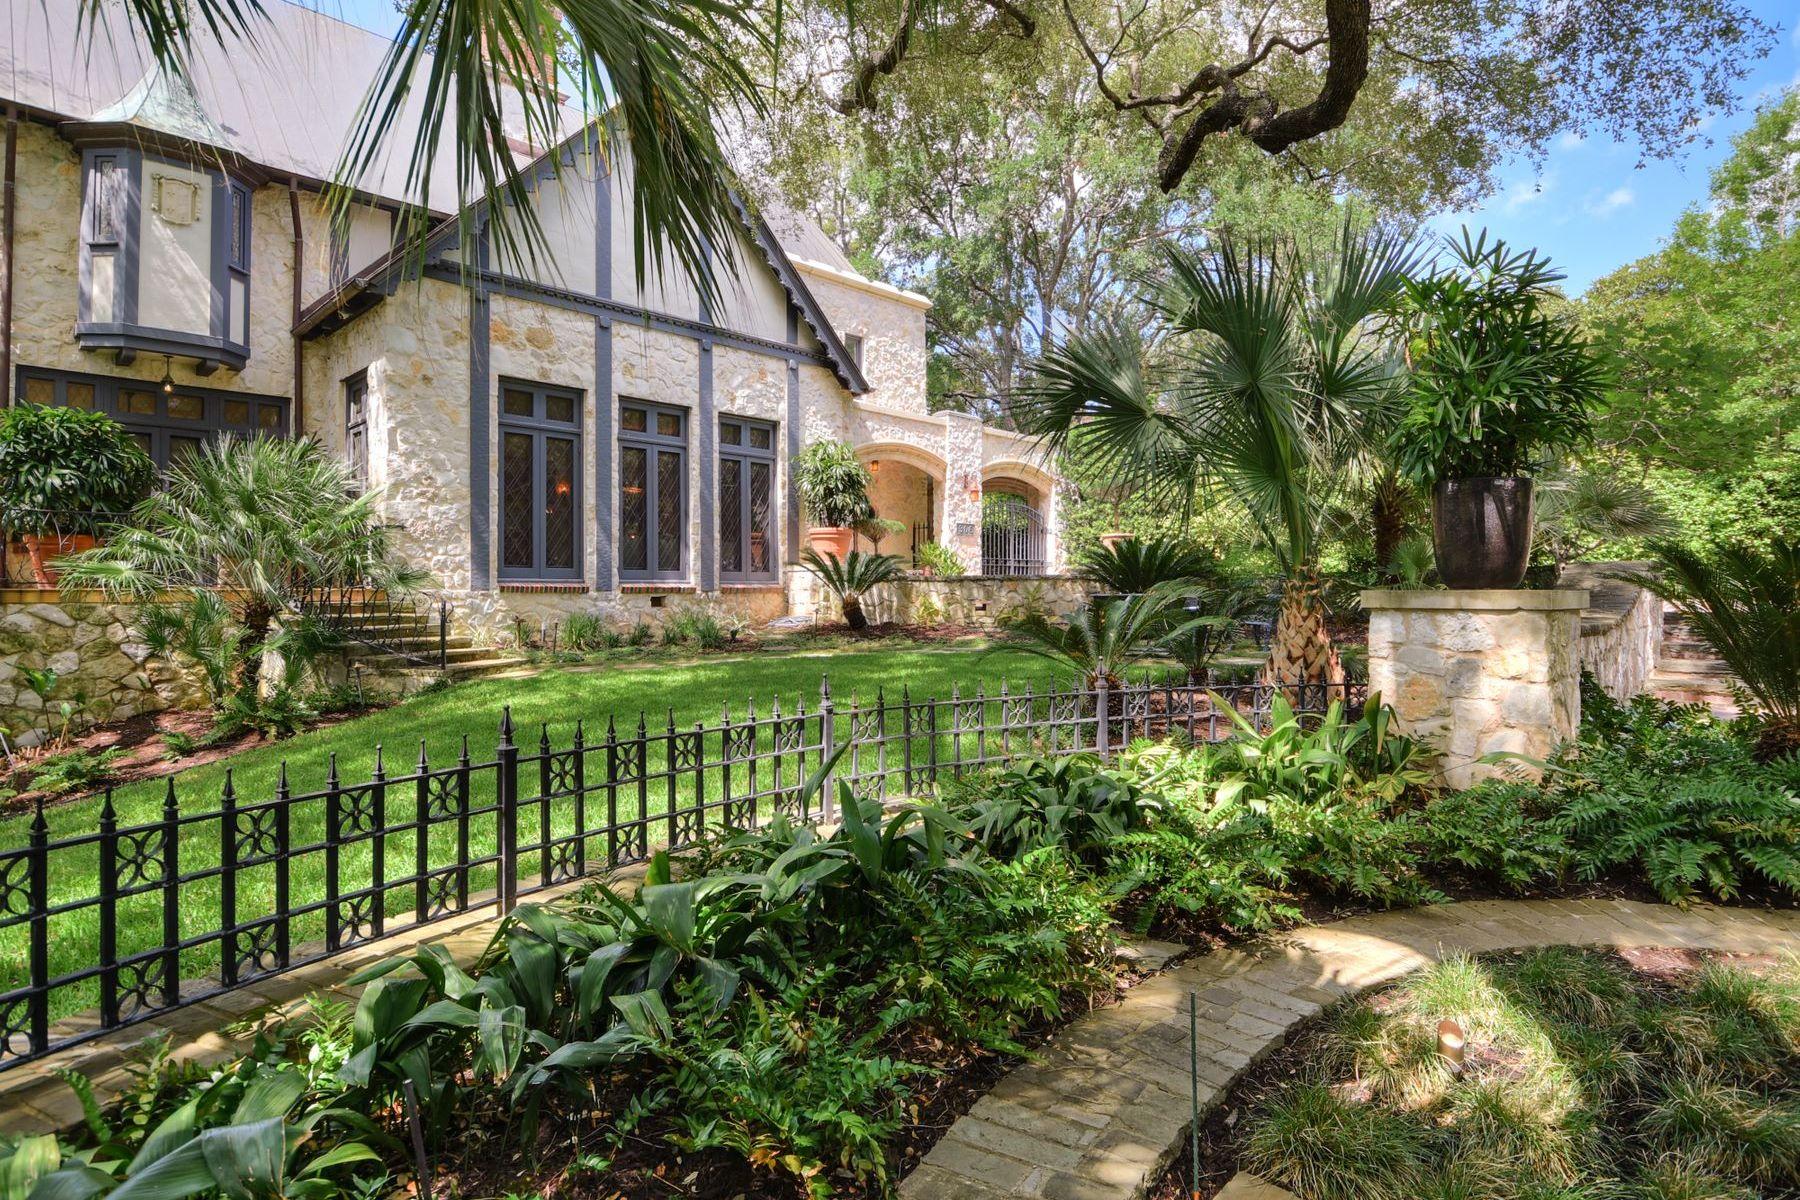 Single Family Homes для того Продажа на Upper Olmos Park Masterpiece which Captures a Moment in Time 306 East Hermosa Drive, San Antonio, Техас 78212 Соединенные Штаты